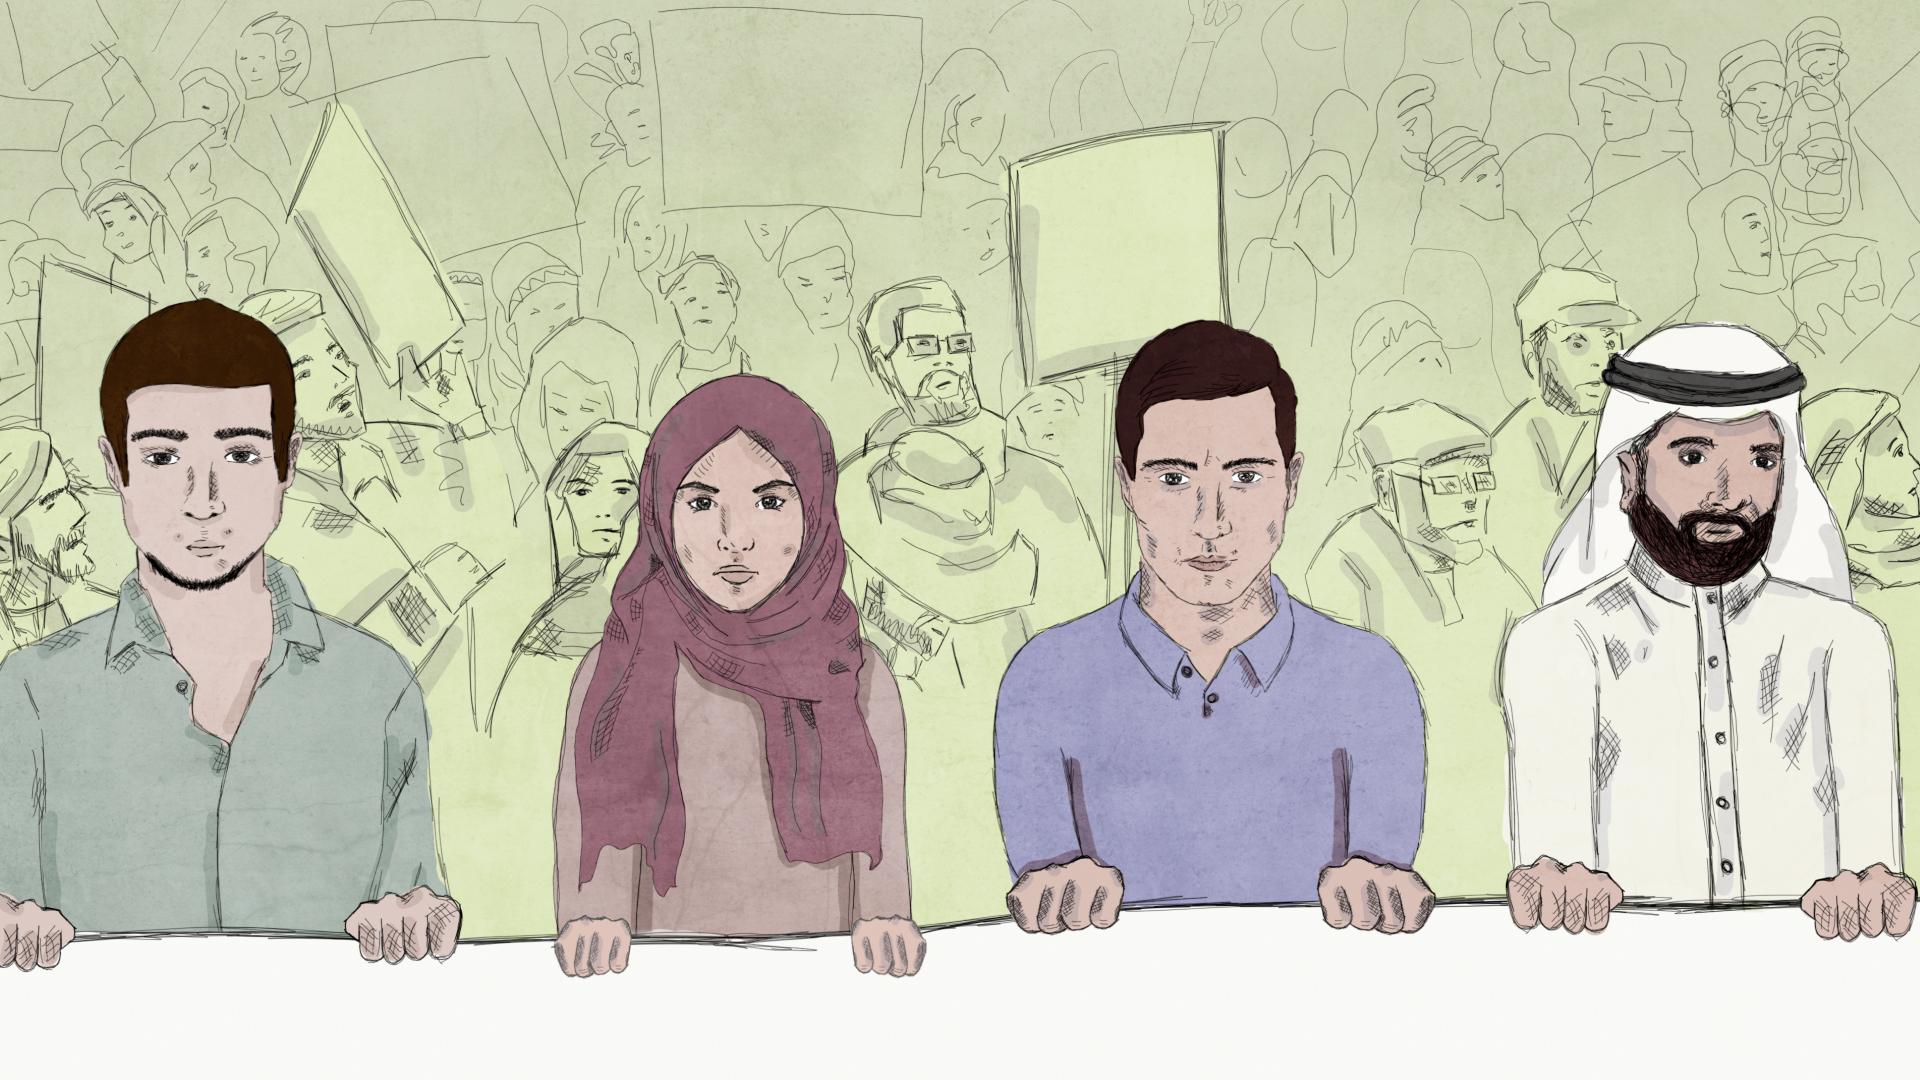 Saudi Arabia: Specialized Criminal Court a political tool to muzzle critical voices